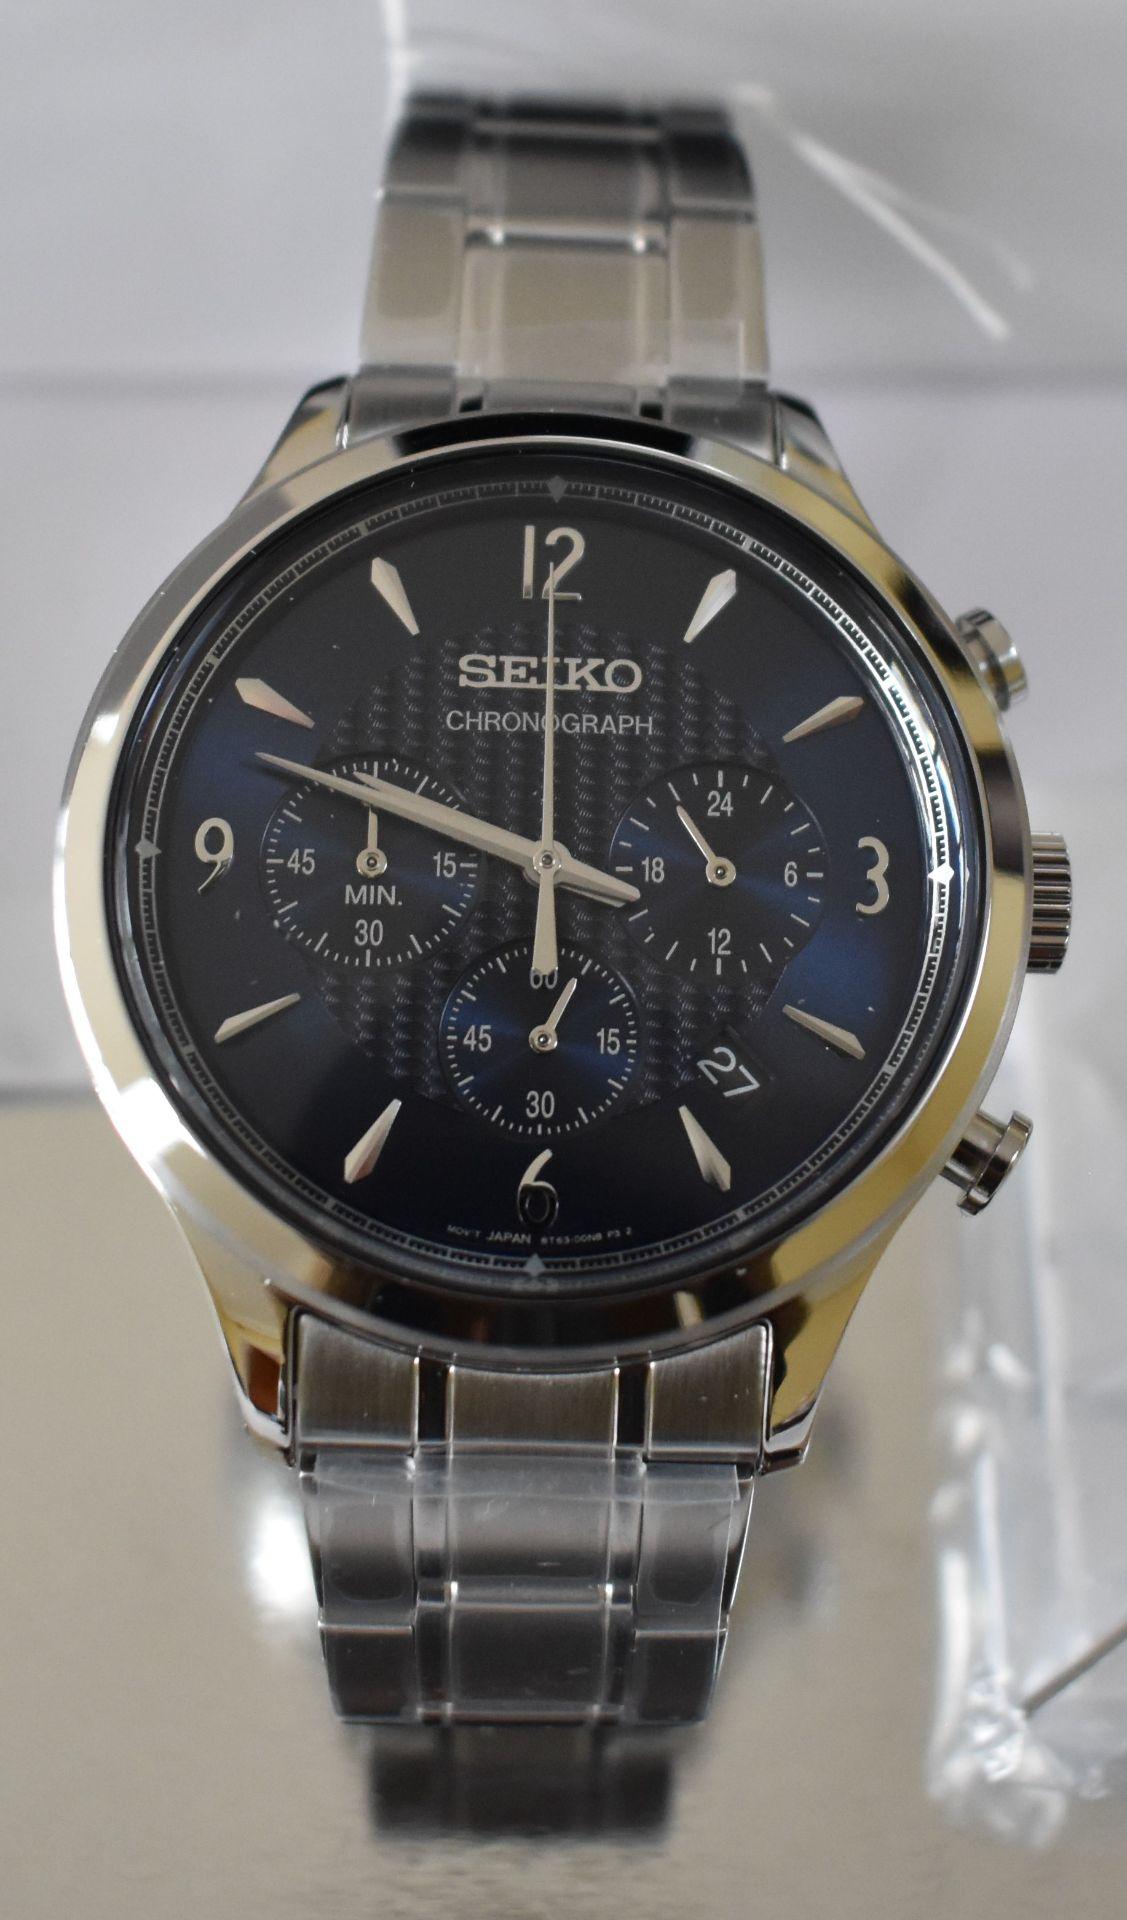 Seiko Men's Watch SSB339P1 - Image 2 of 2